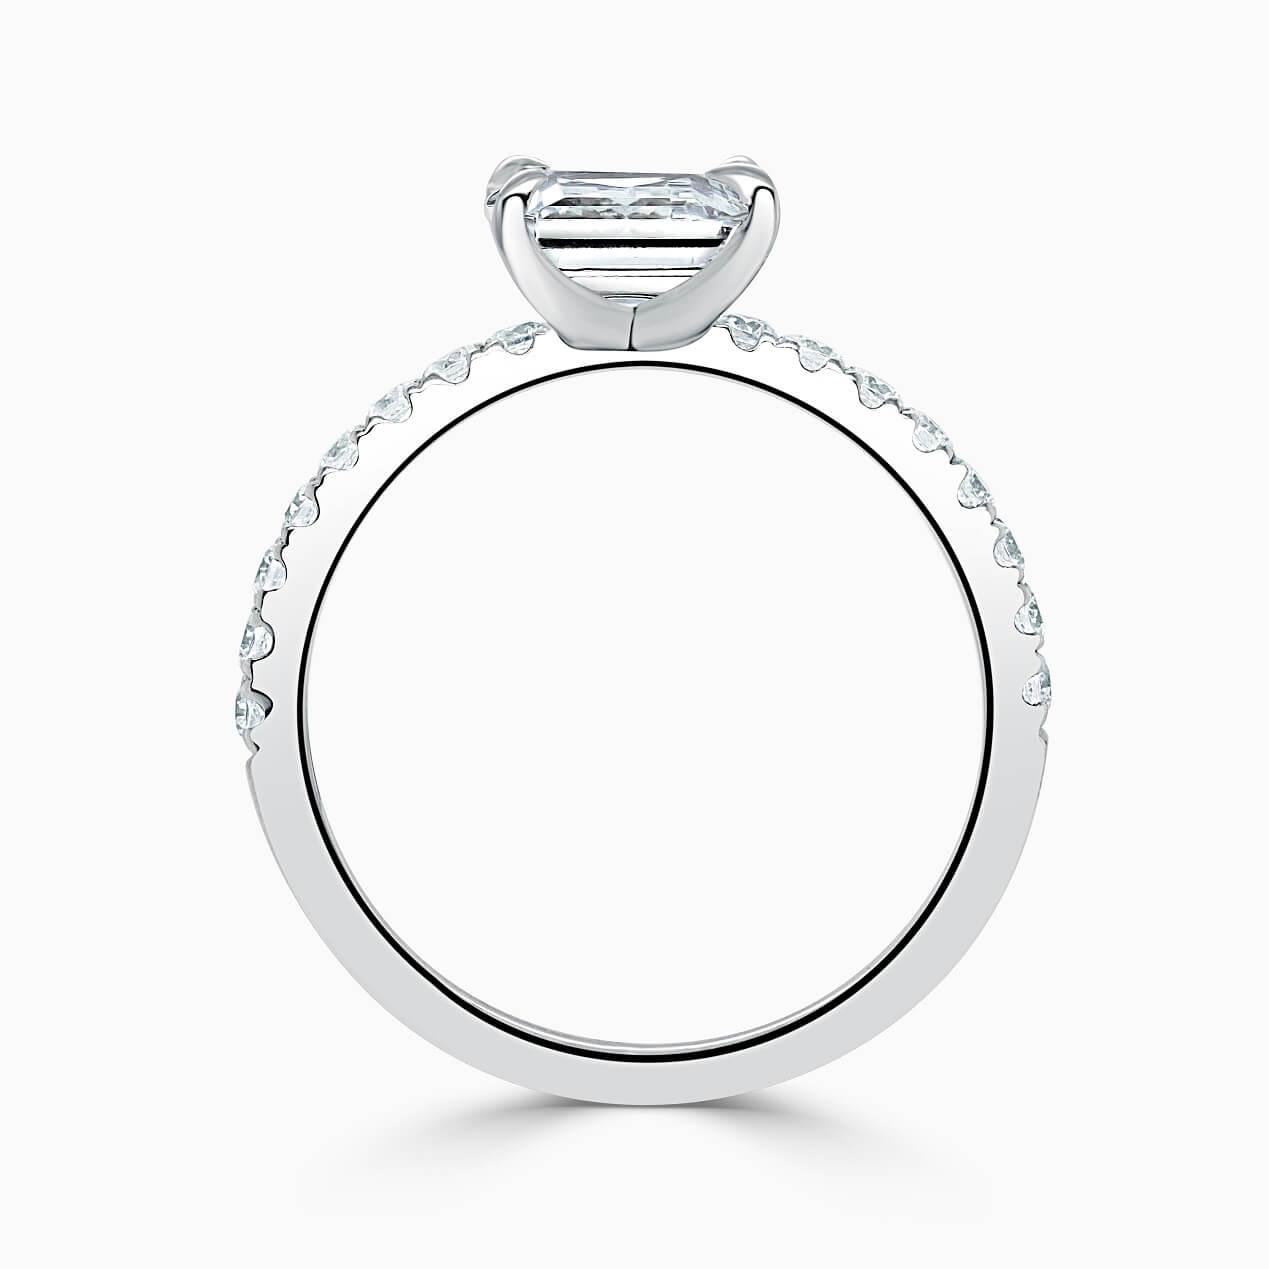 Platinum Emerald Cut Side Cutdown Engagement Ring